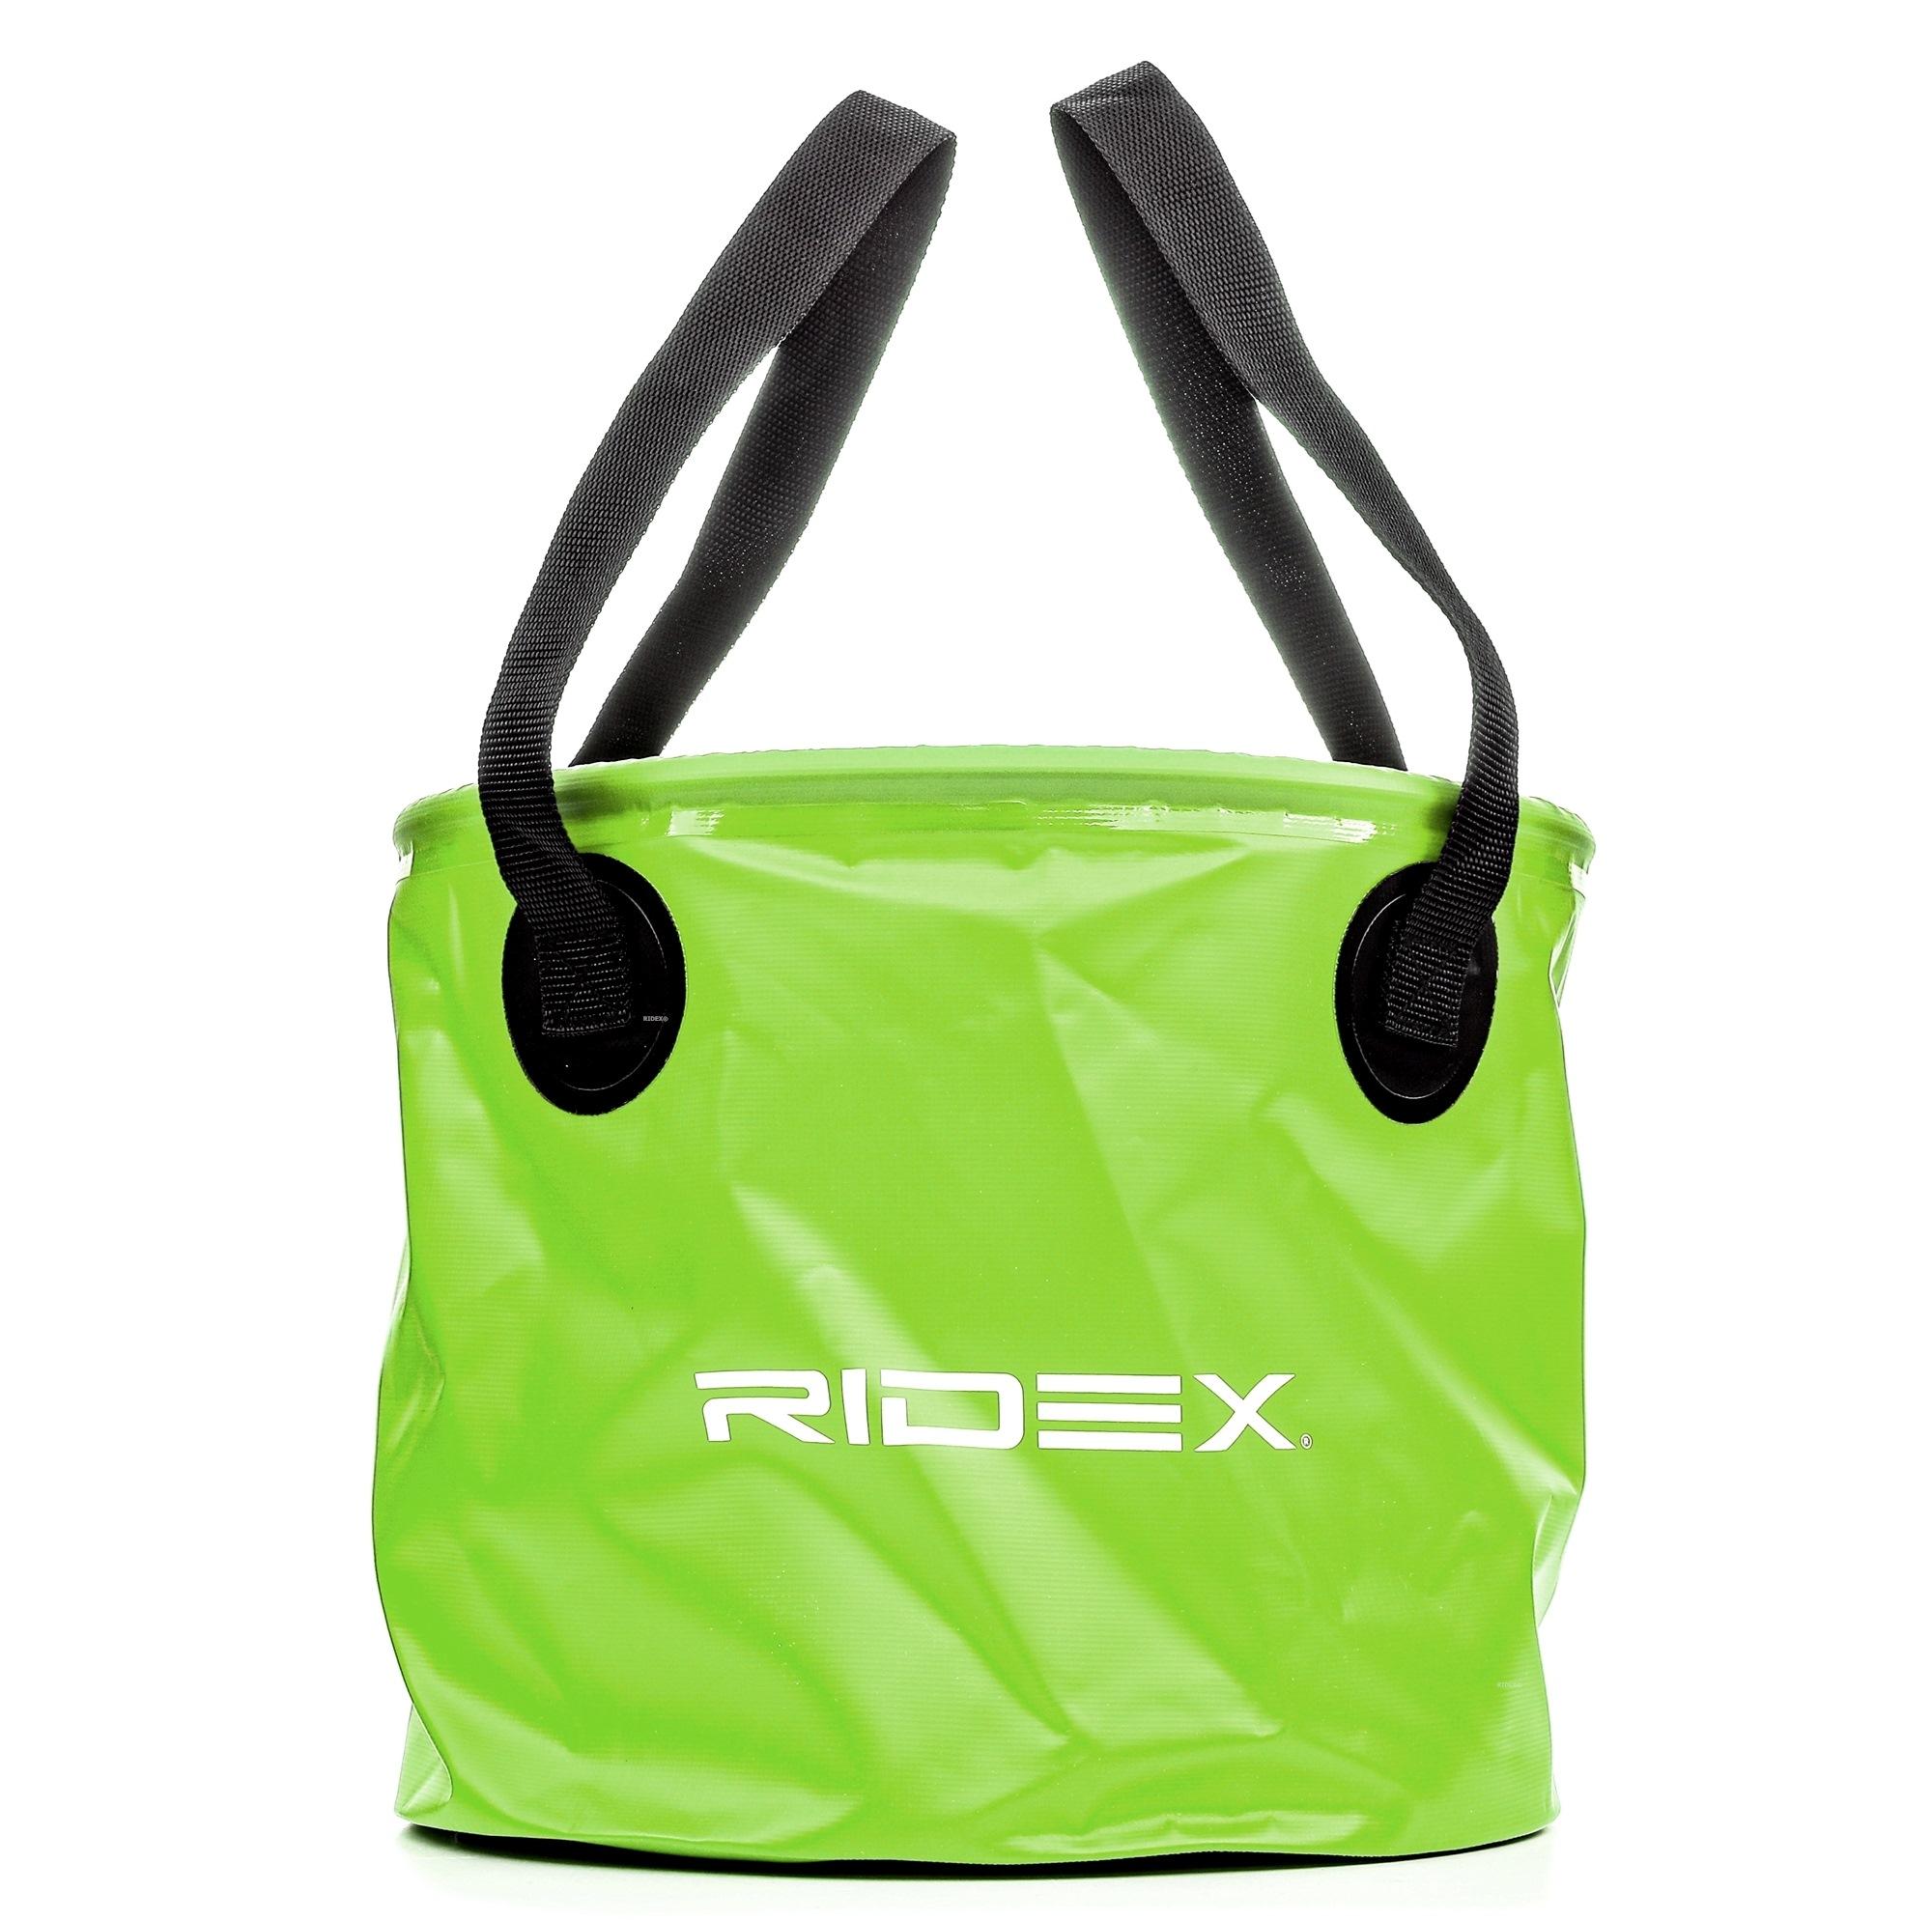 Folding bucket RIDEX 100185A0004 rating